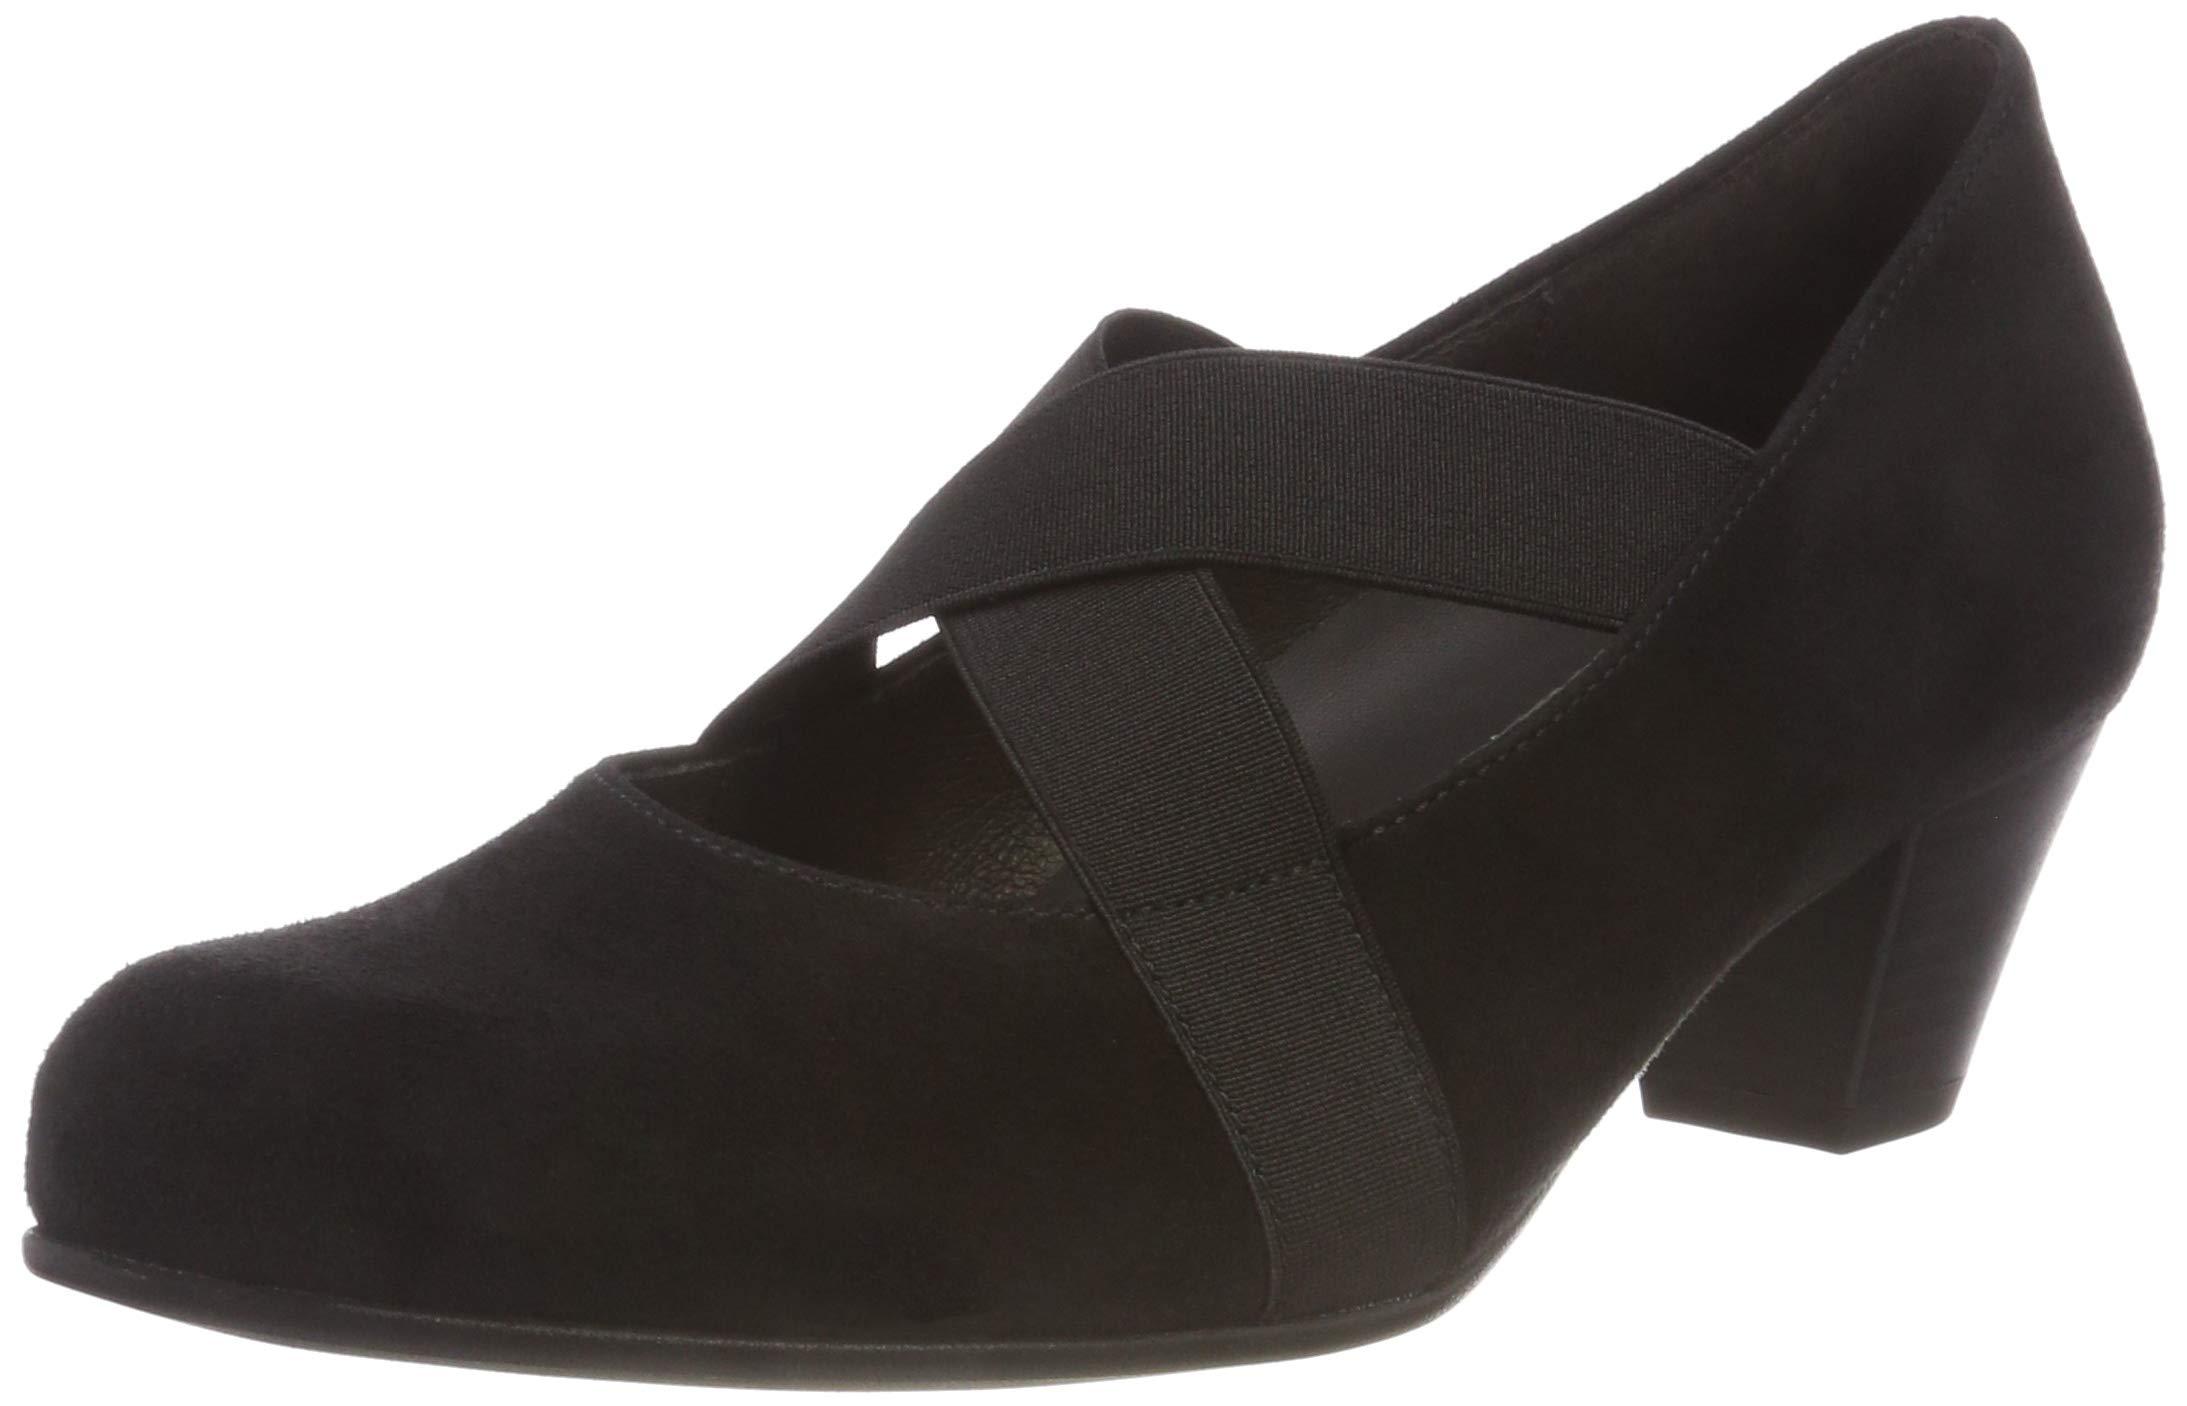 BasicEscarpins Eu 4738 Gabor Shoes Comfort FemmeNoirschwarz dCrxoeWBQ